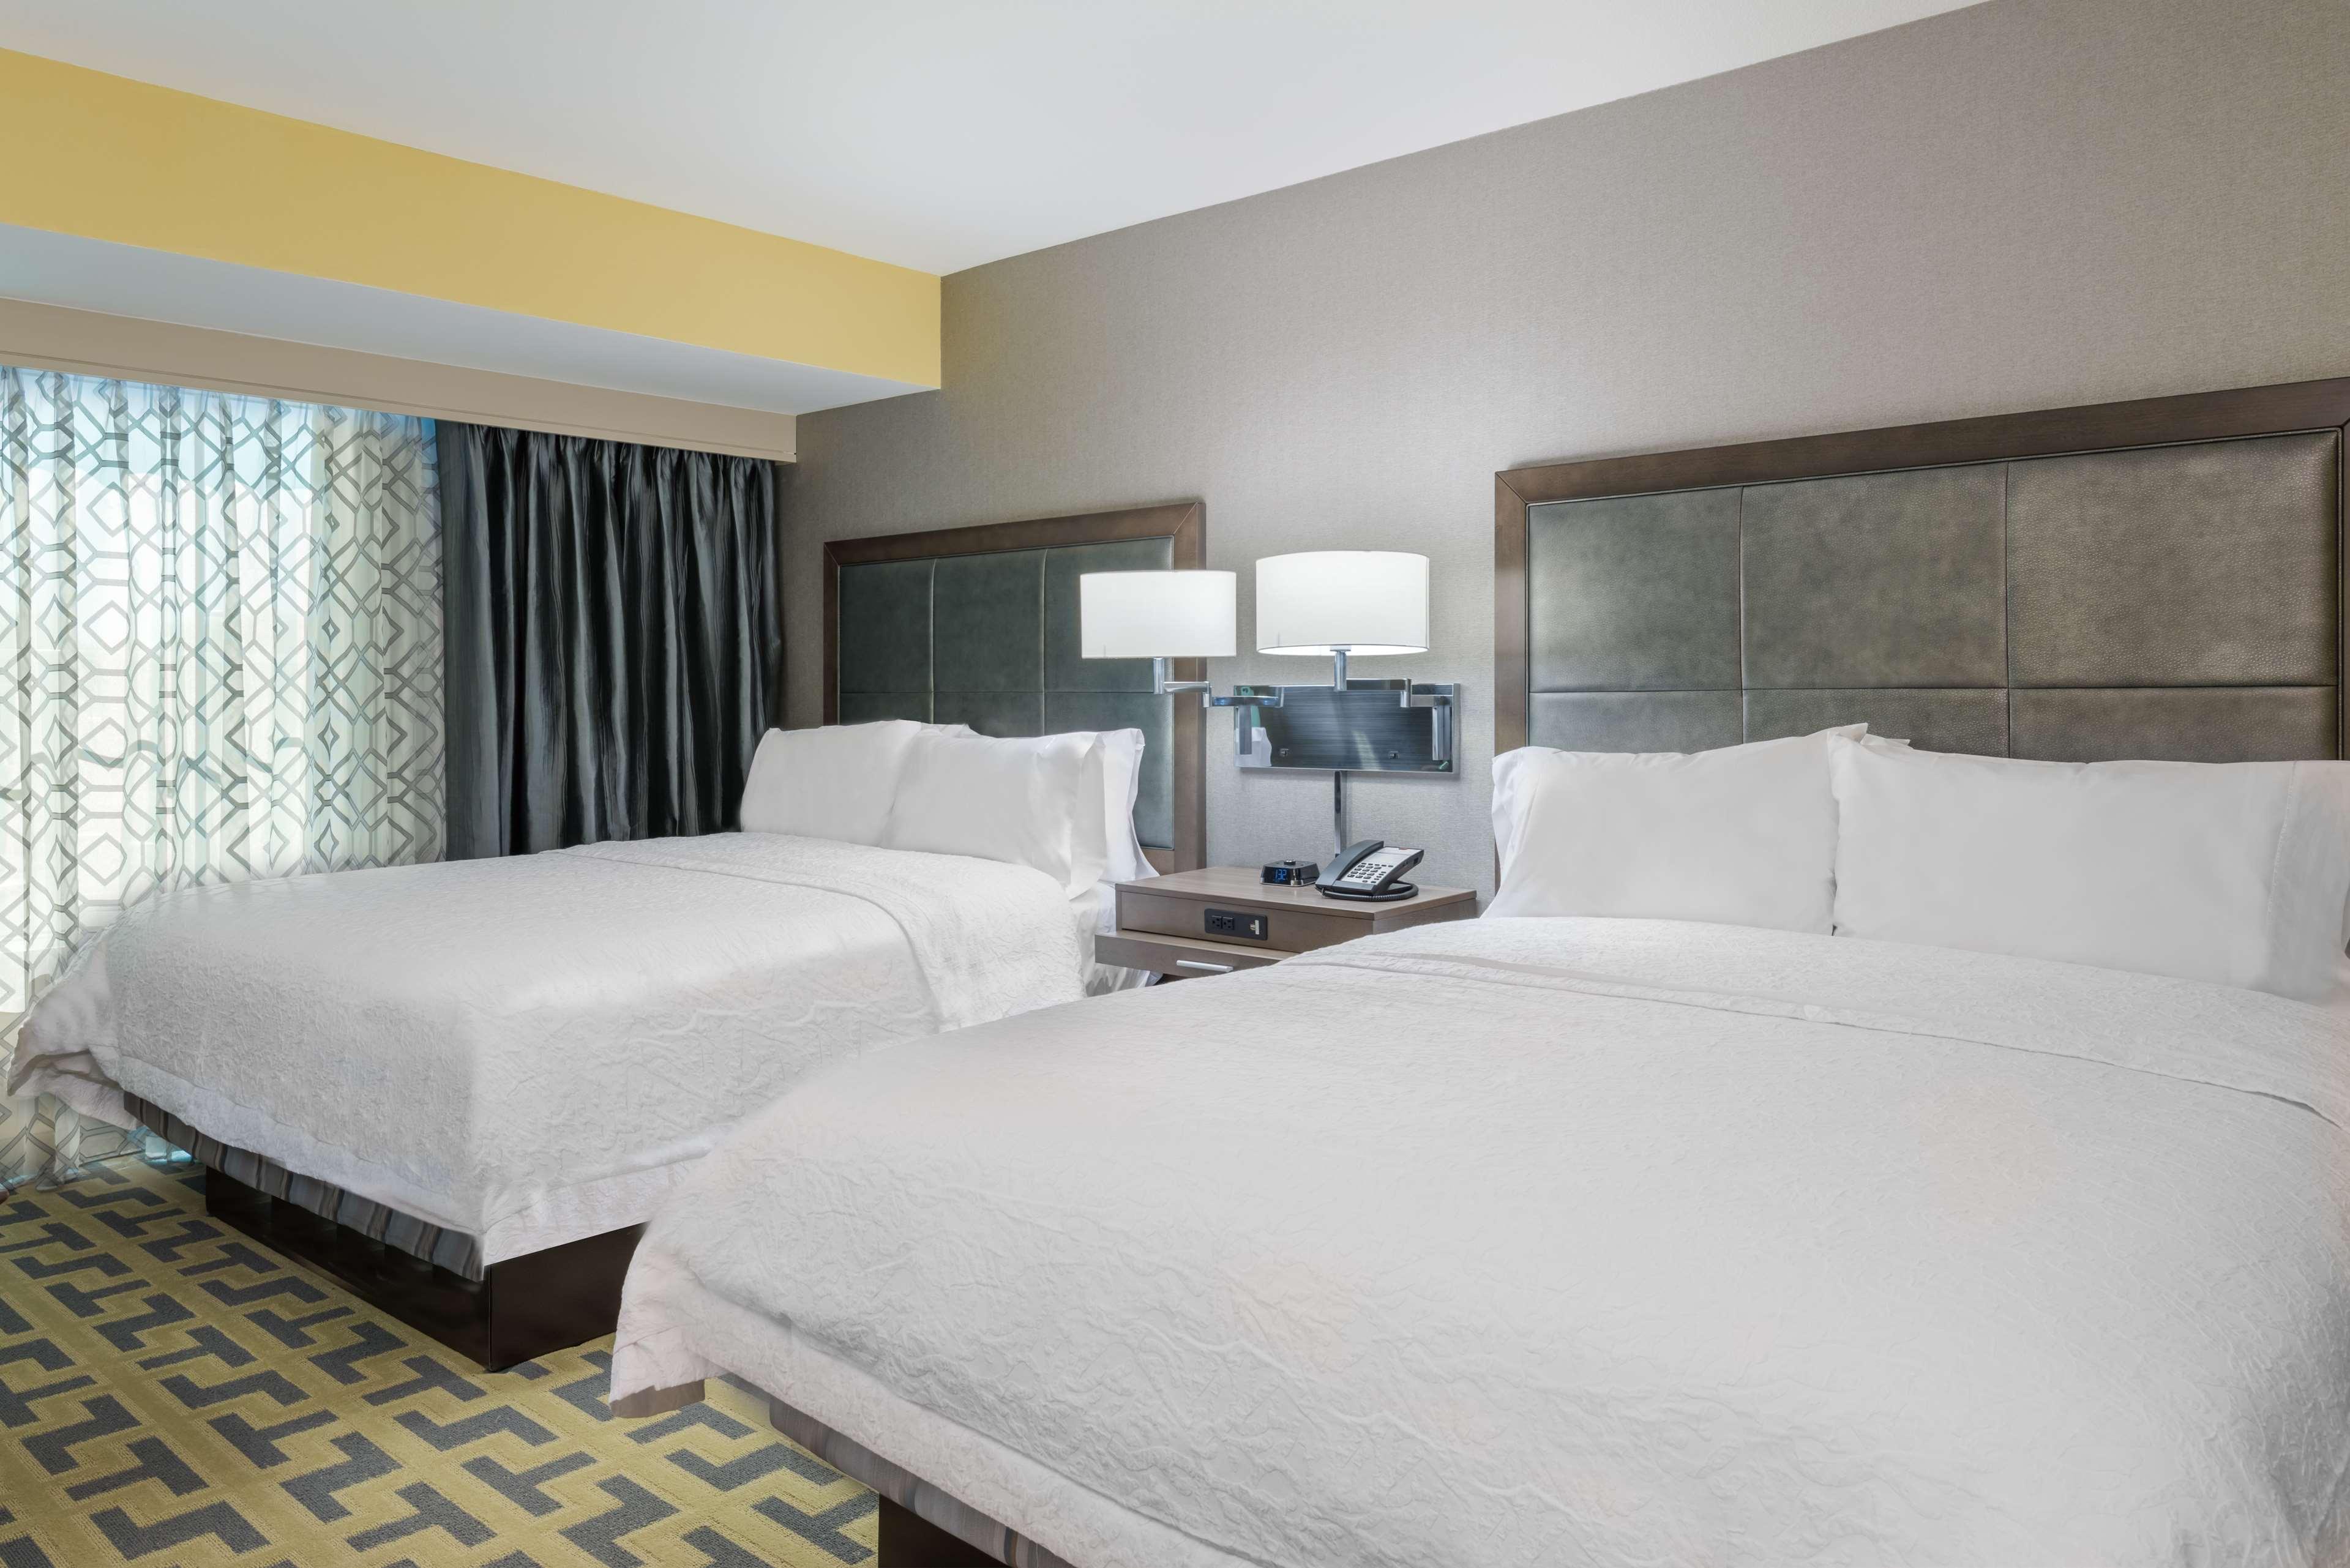 Hampton Inn & Suites Tampa Airport Avion Park Westshore image 26